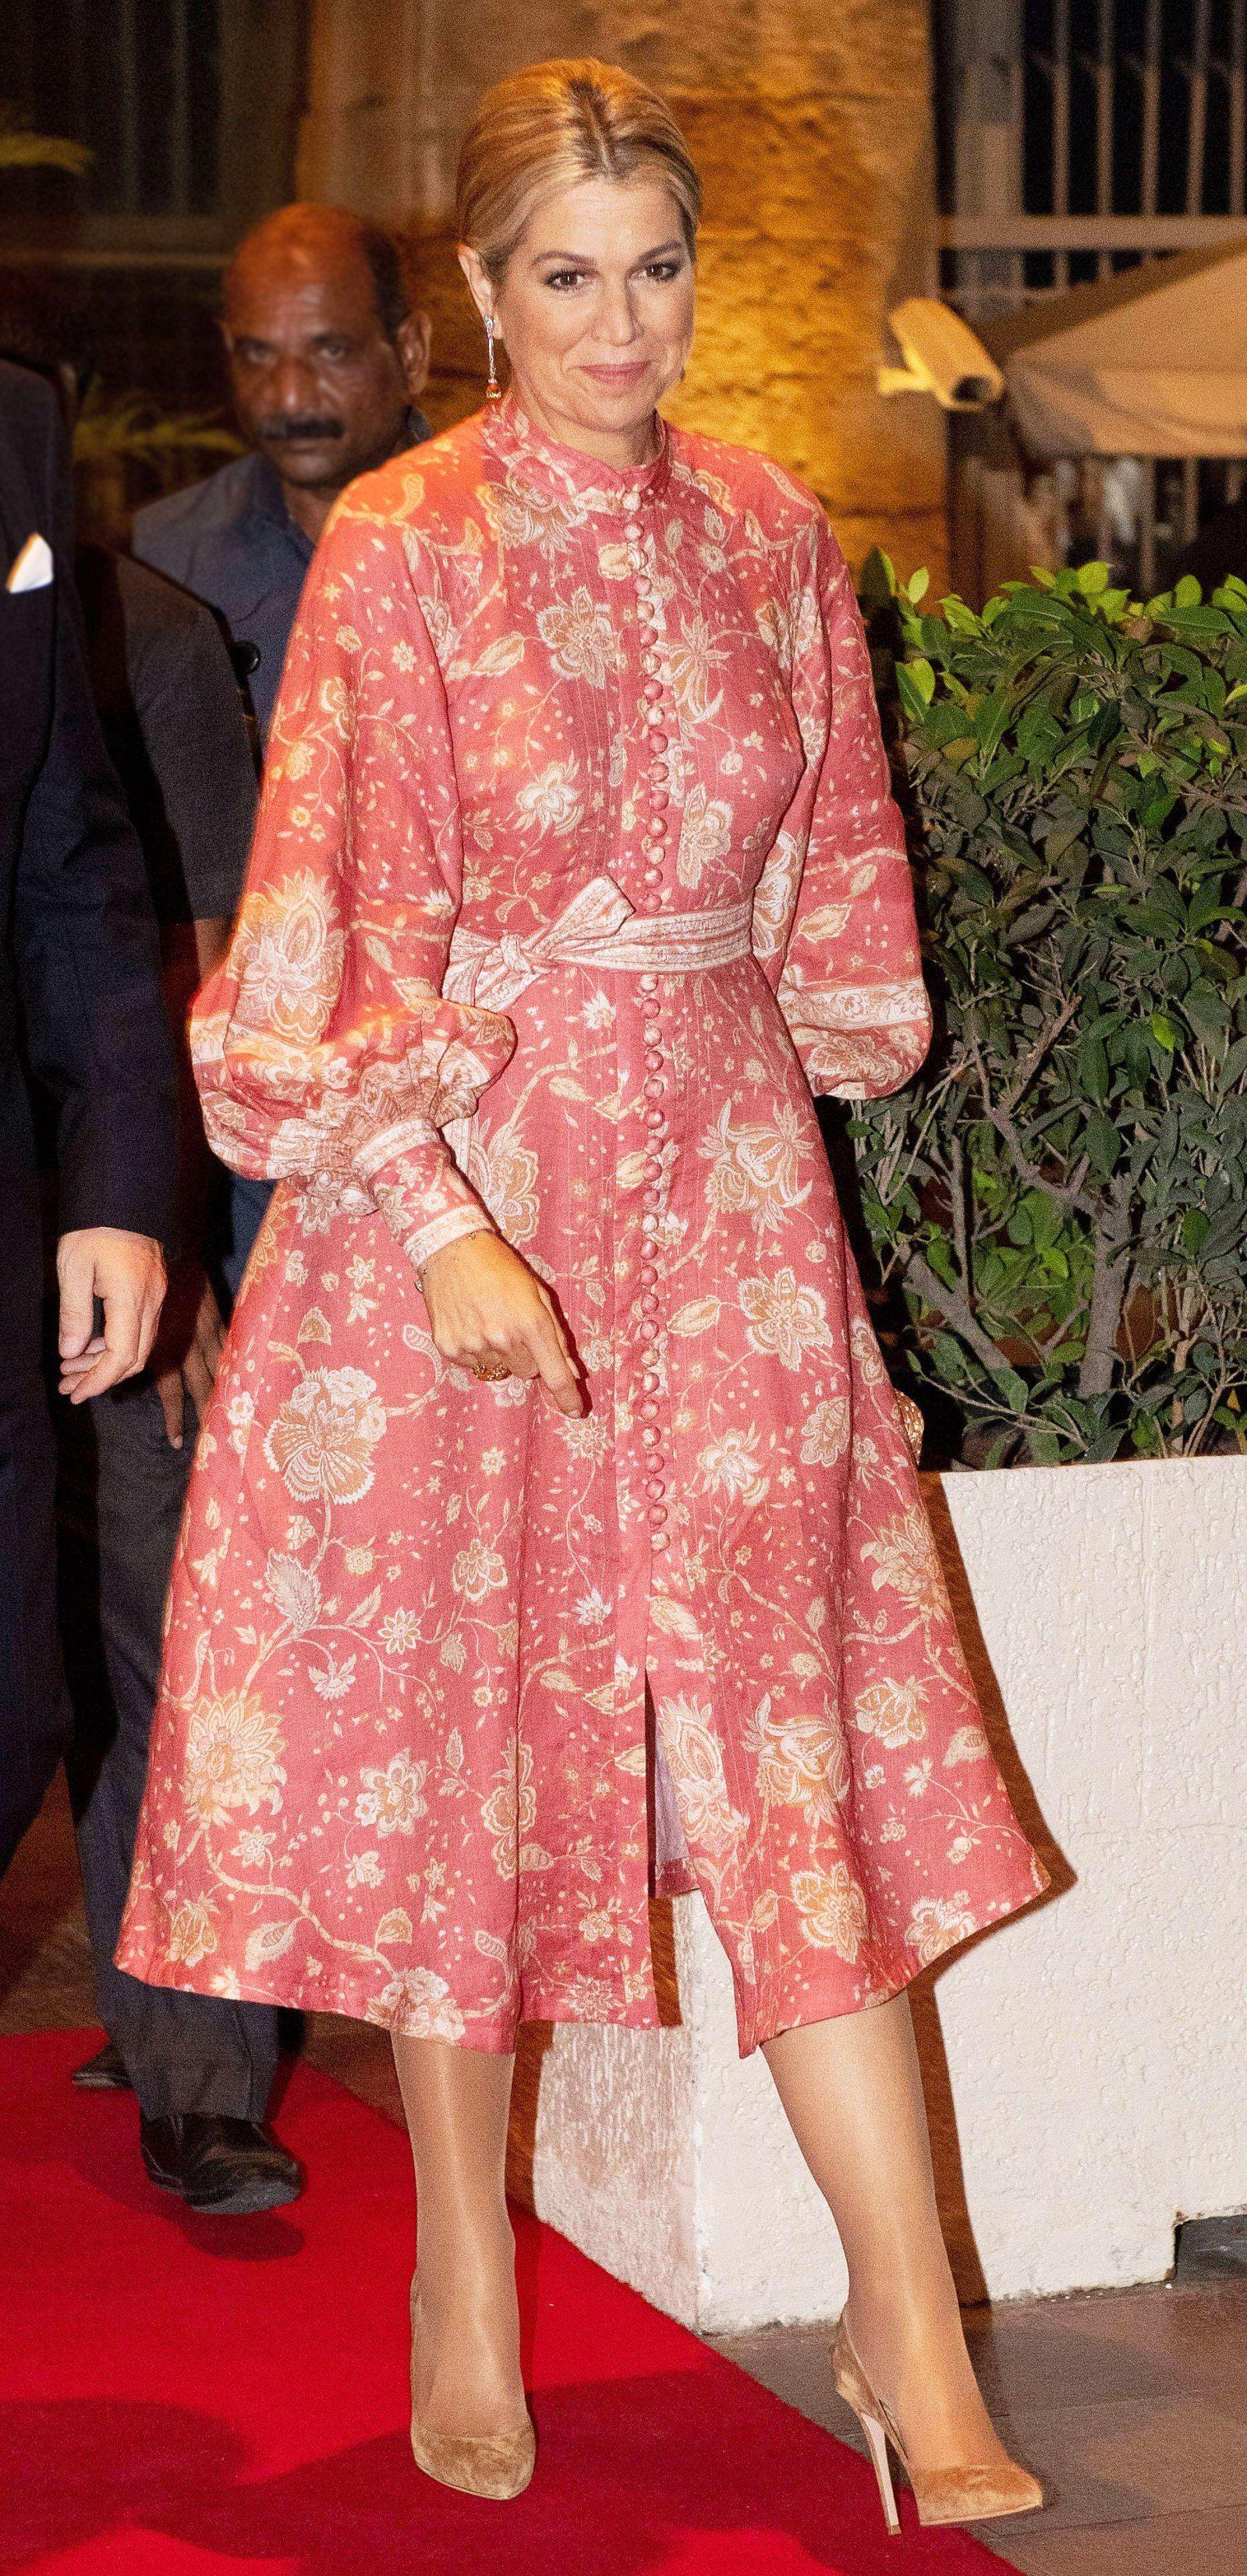 Photo of Königin Maxima ist Ihre nächste Royal Fashion Obsession